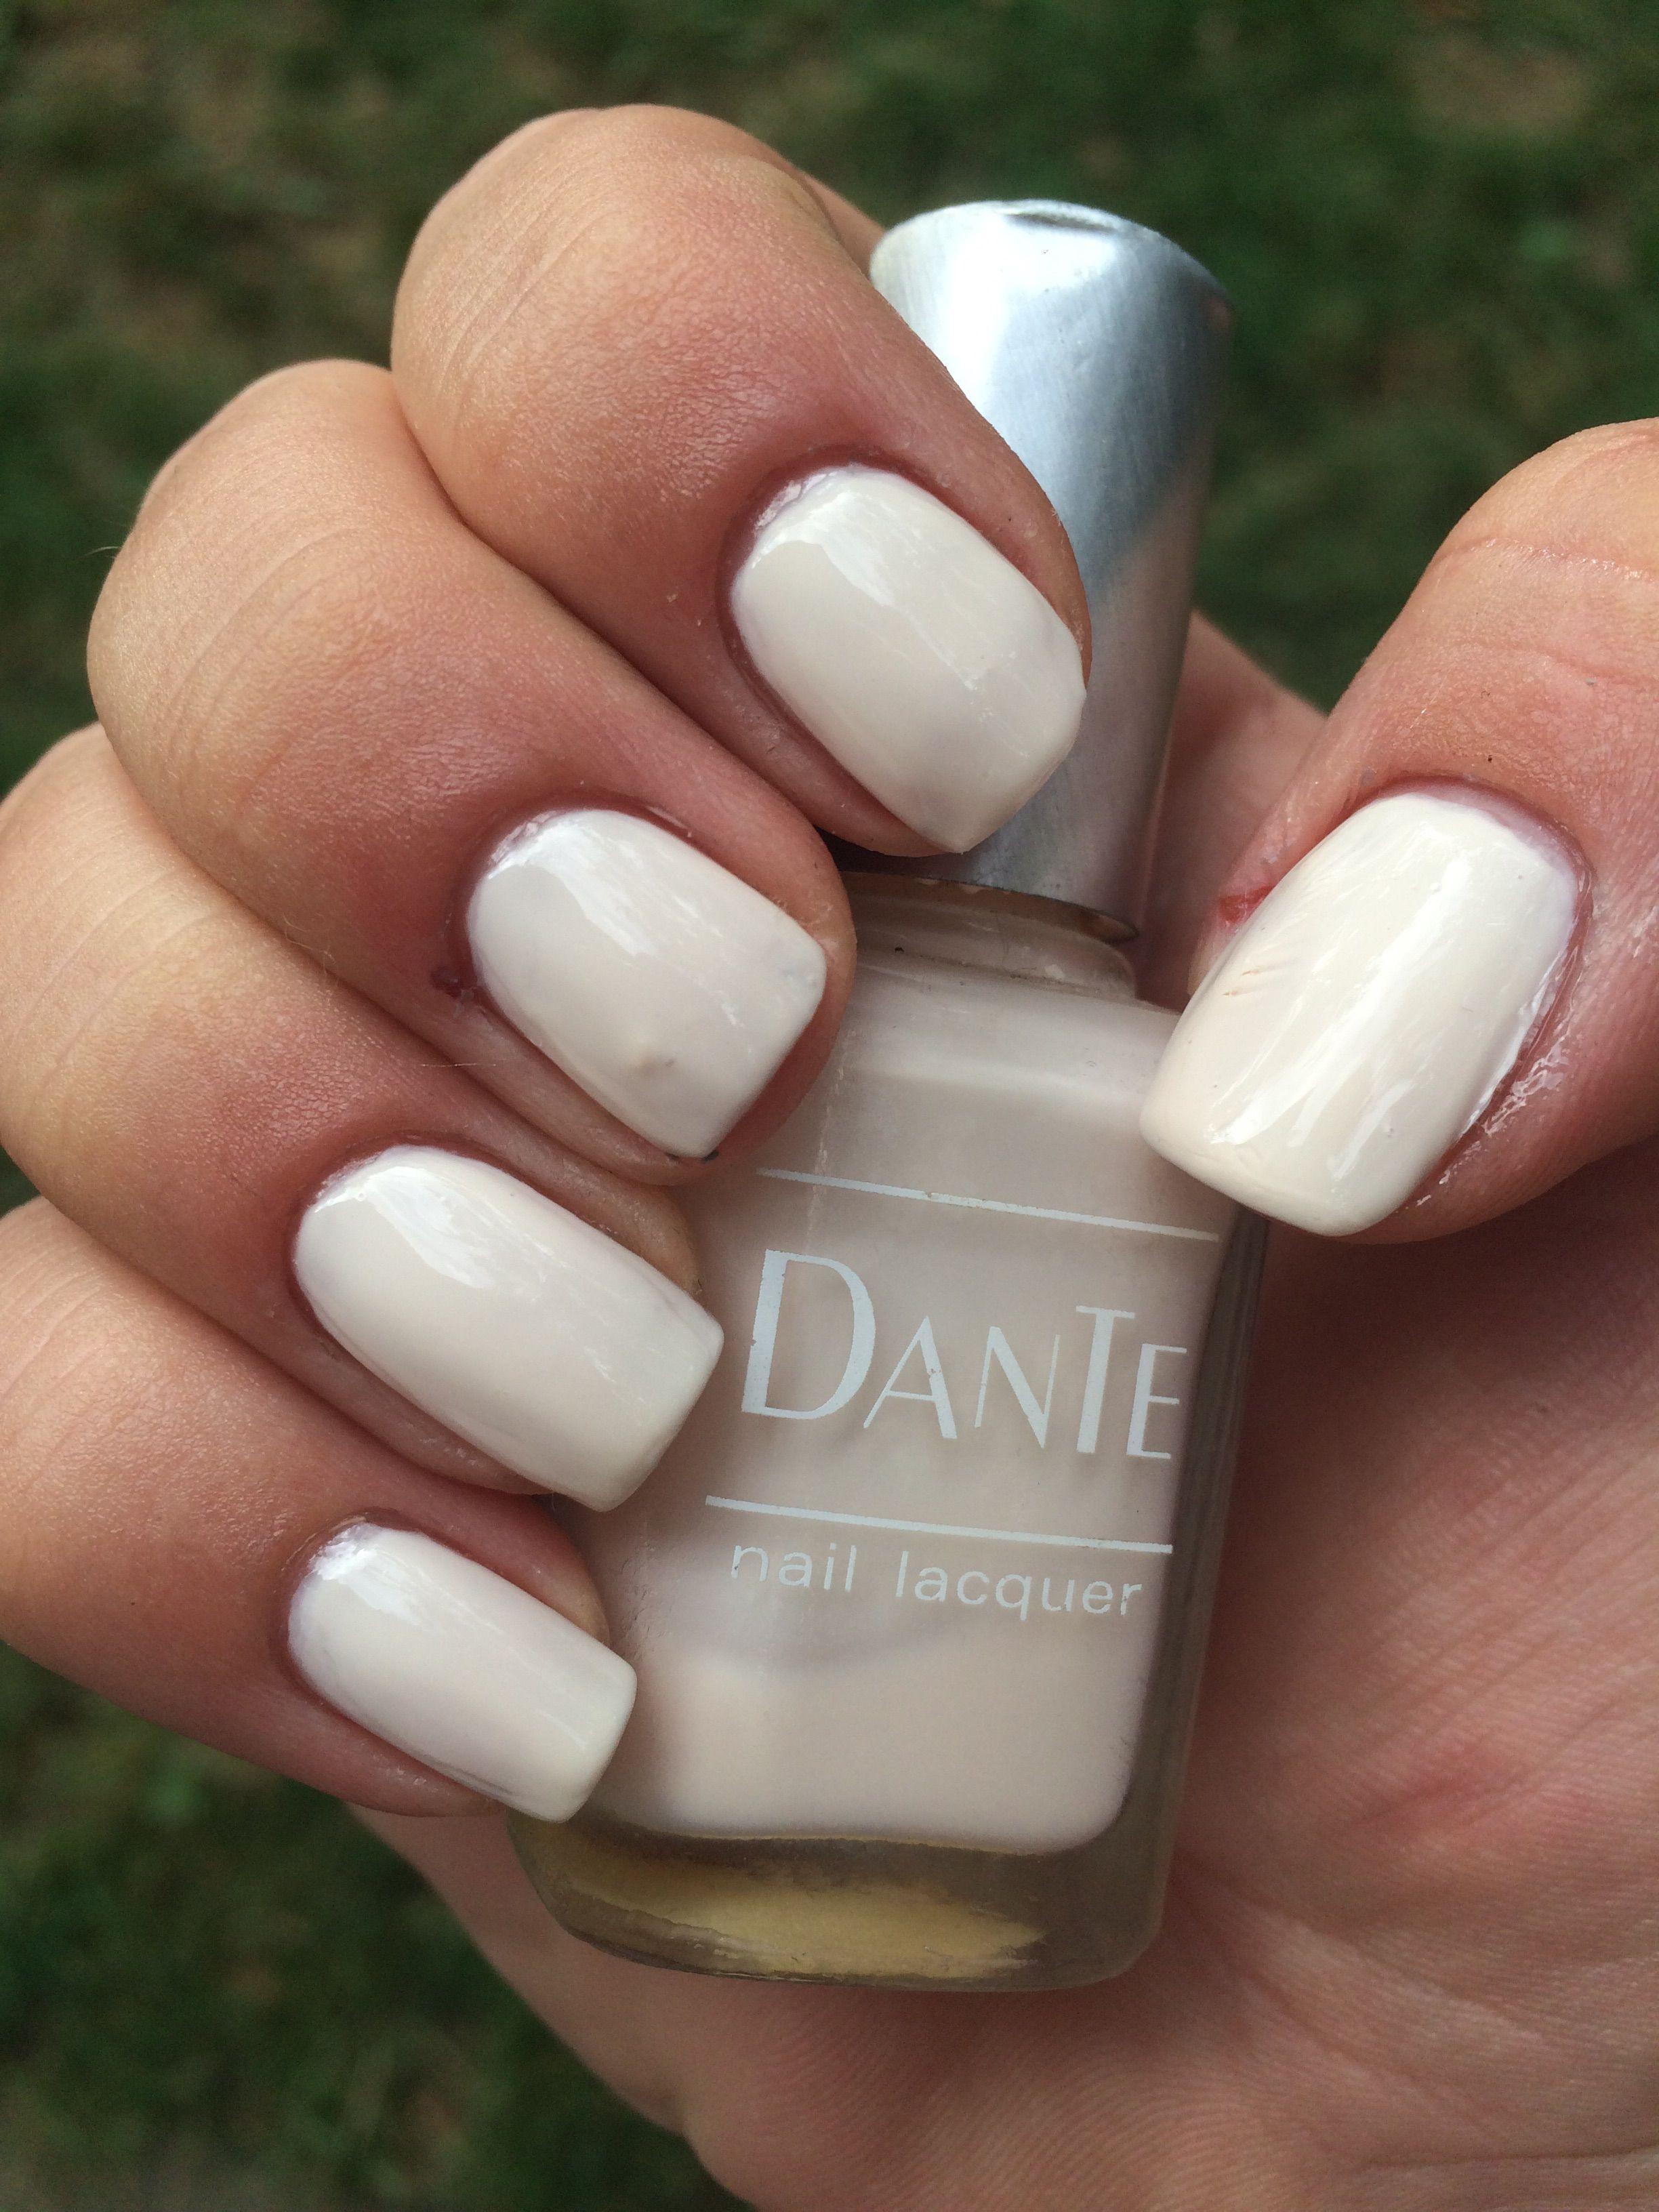 45. Dante: Soca #Nails #NailPolish #NailPolishCollection #NailPorn ...